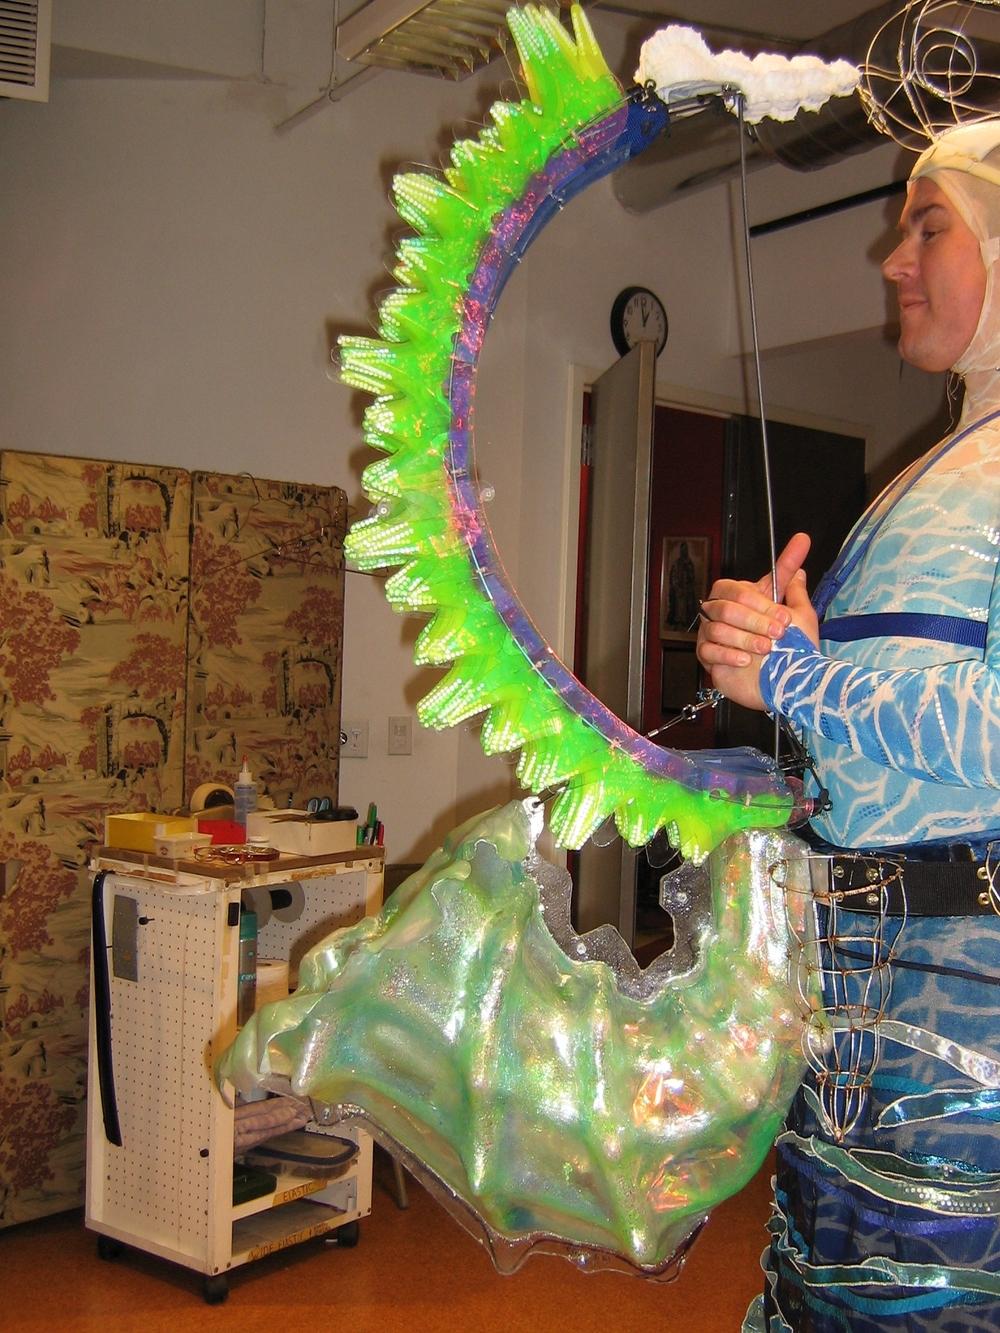 The Little Mermaid Blowfish Saxophone